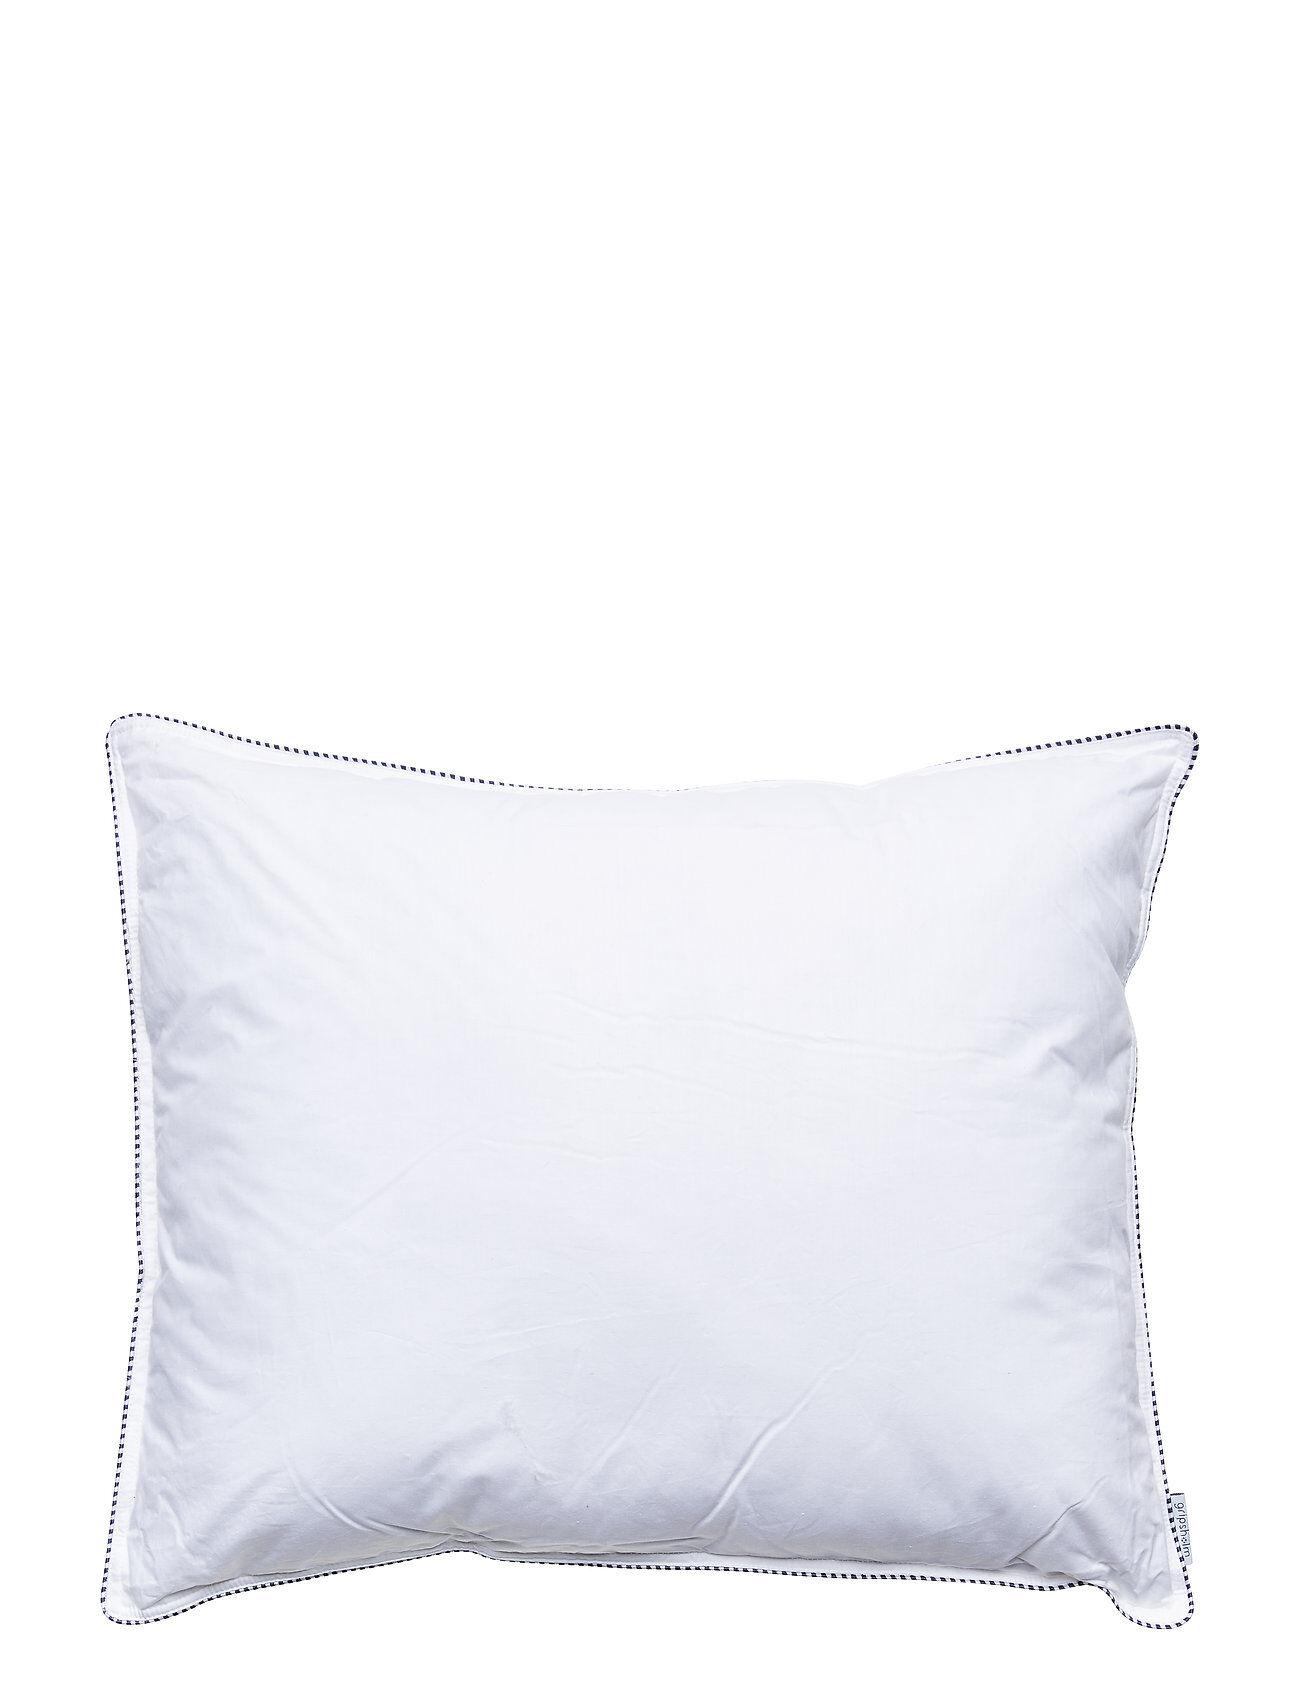 Gripsholm Pillow Nelson Medium